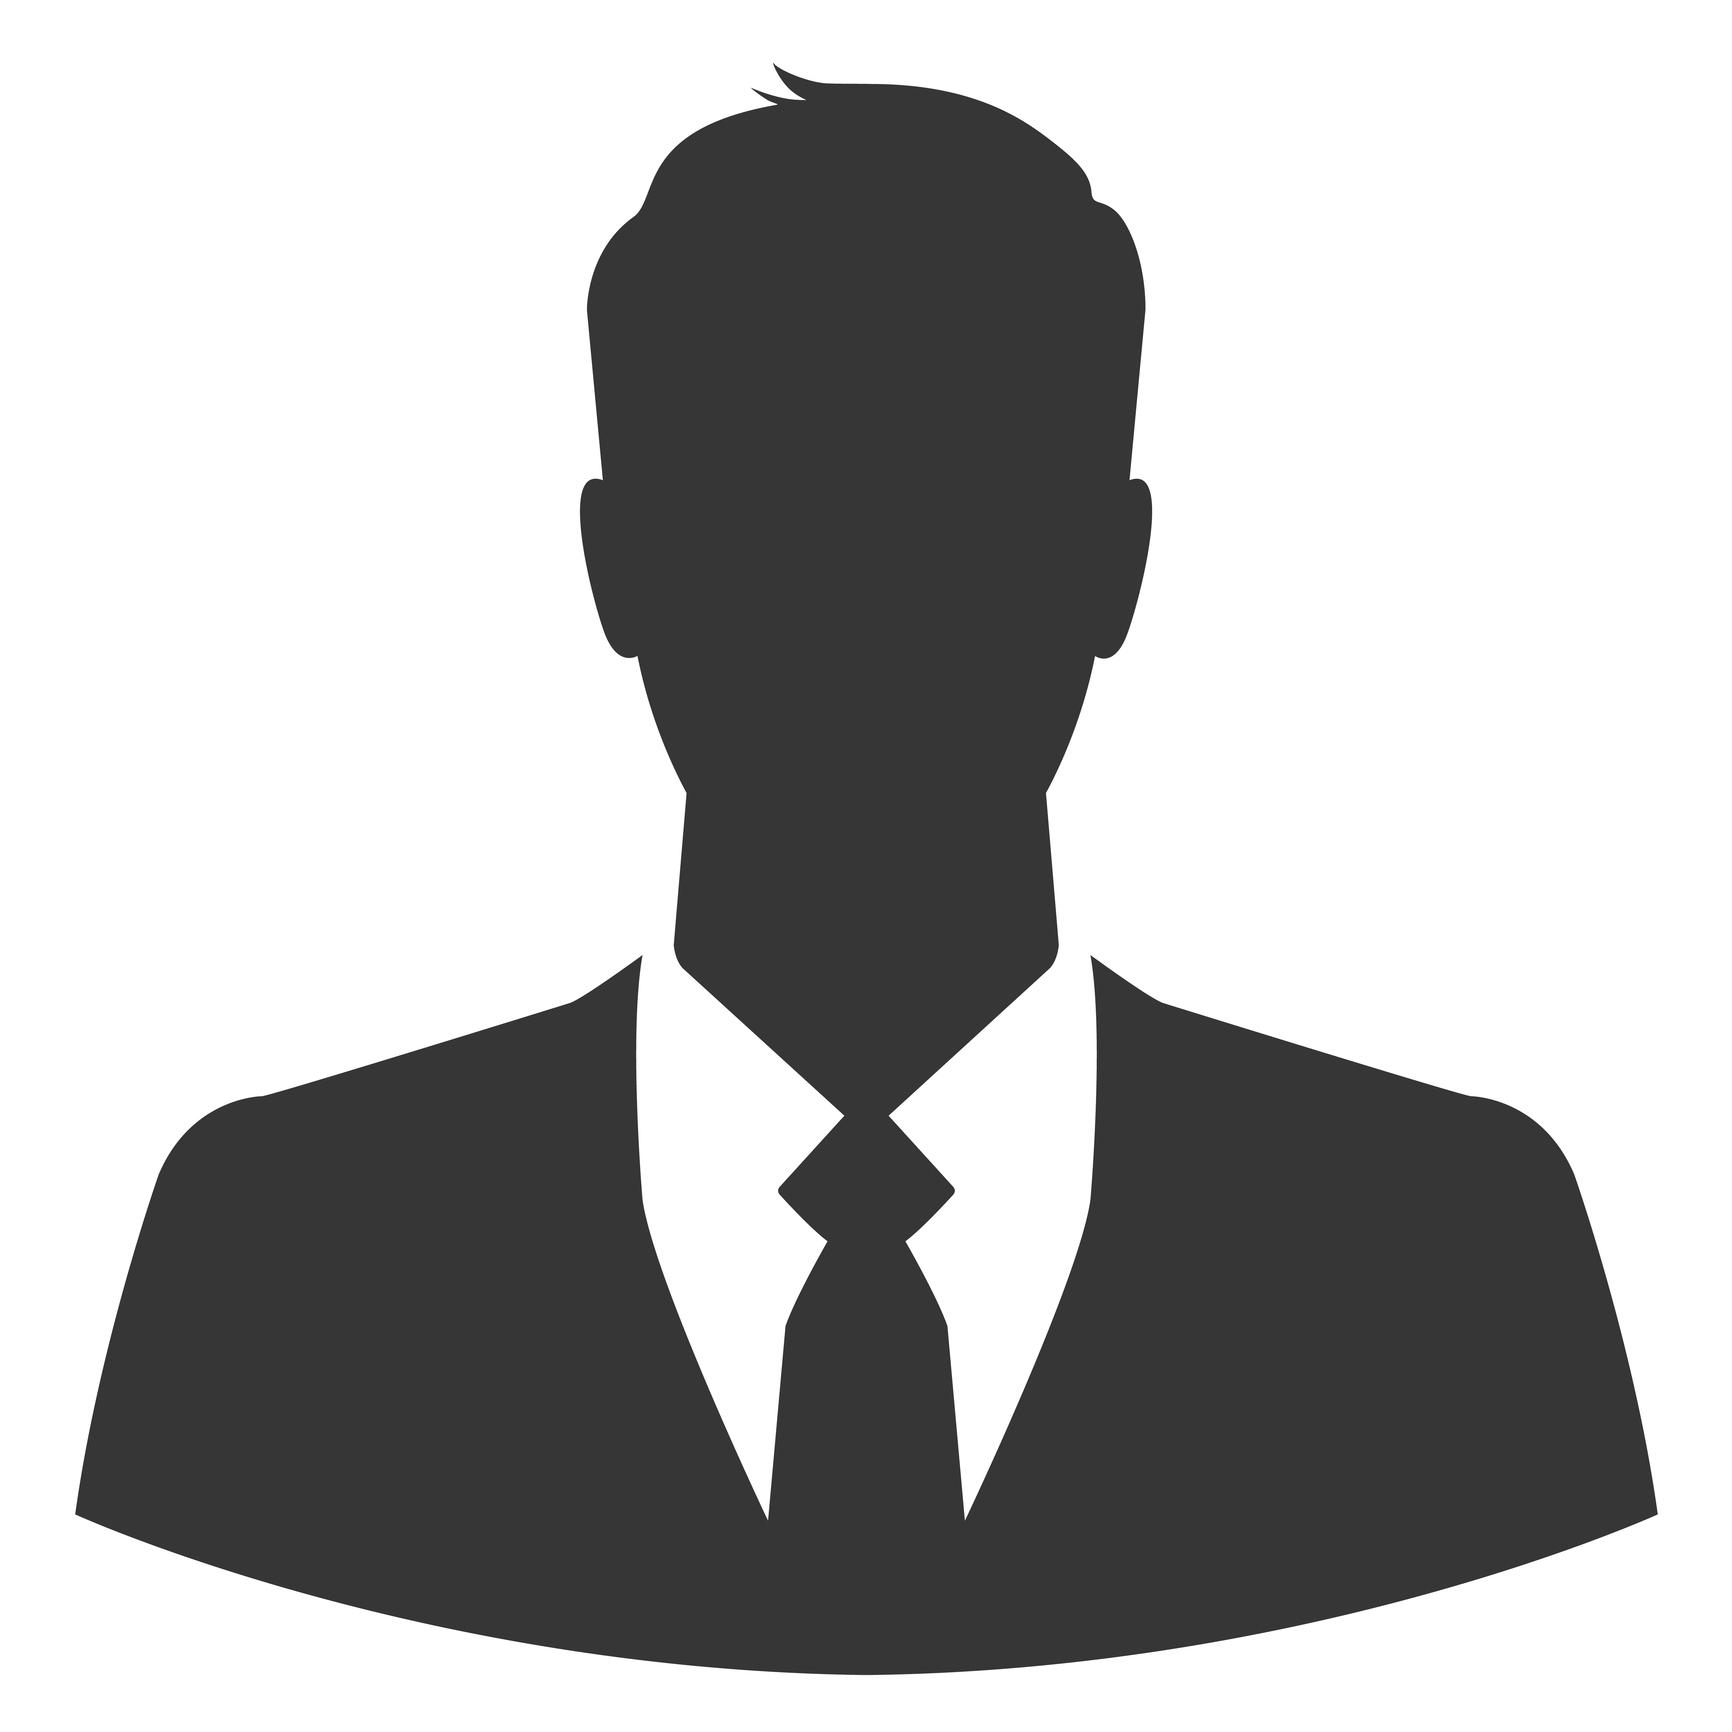 1732x1732 Businessman Silhouette As Avatar Or Default Profile Picture